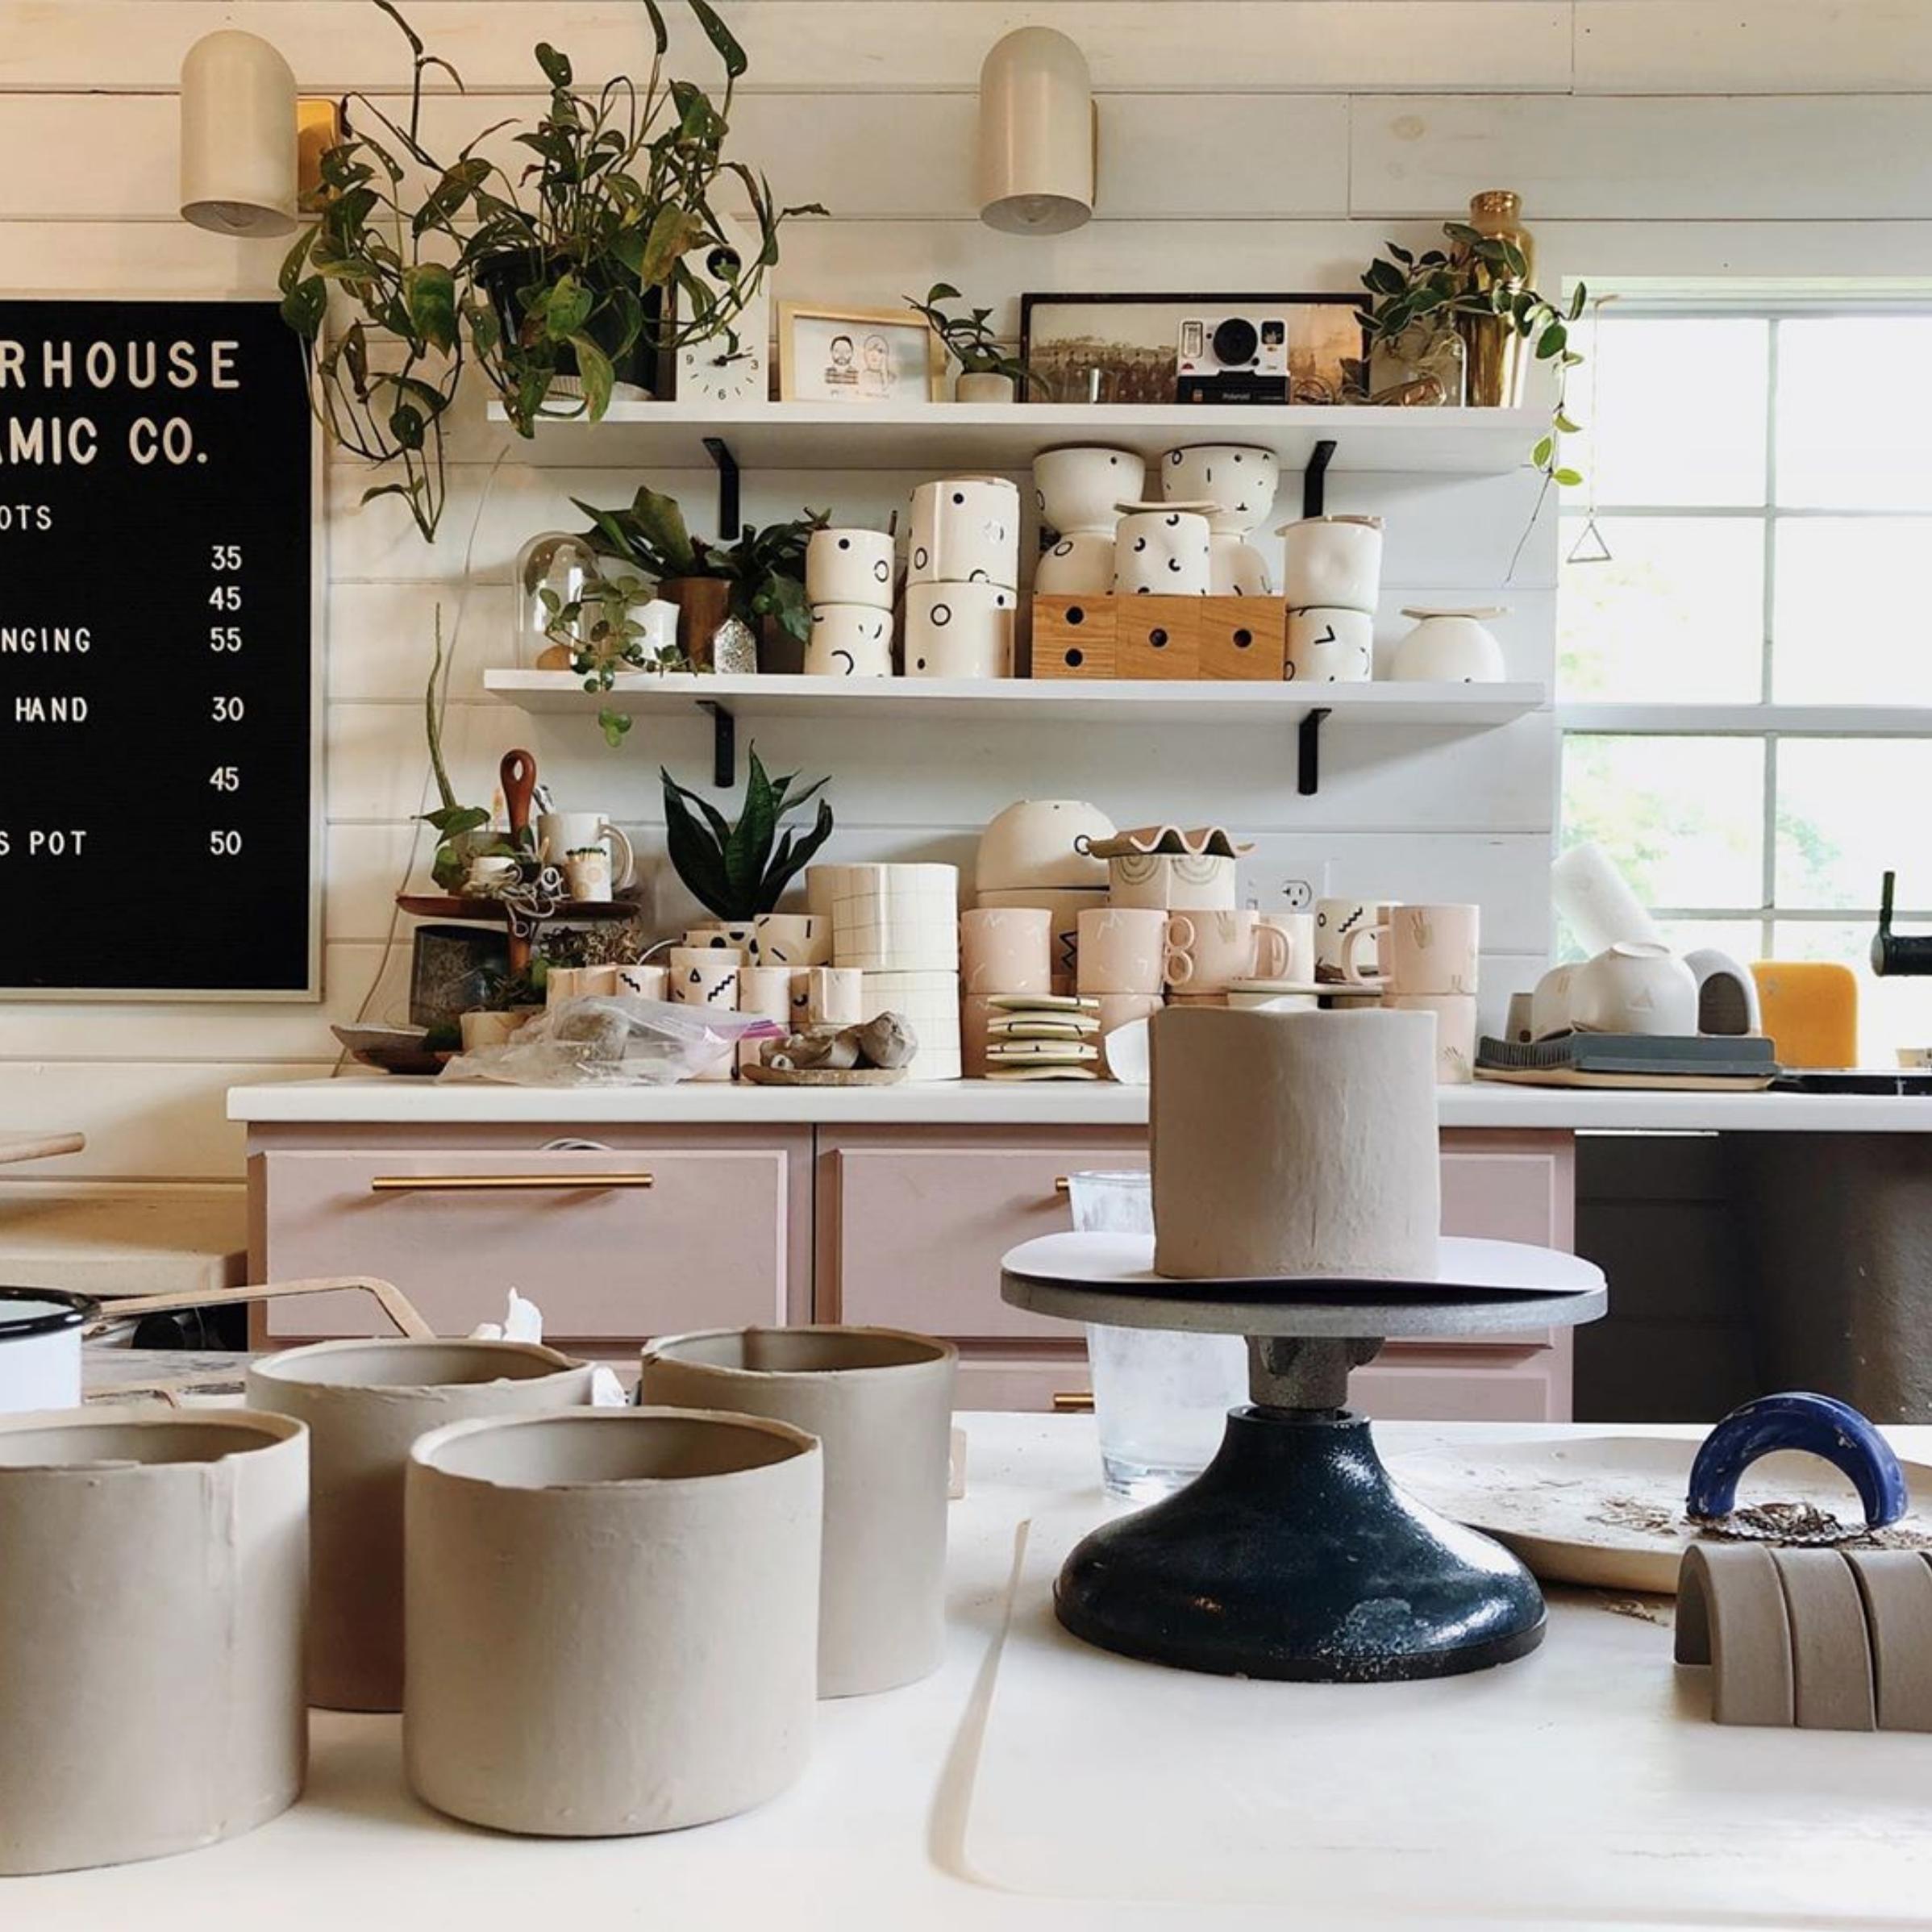 Where Makers Make_Natasha Lawyer_Sugarhouse Ceramics_Studio 15.png